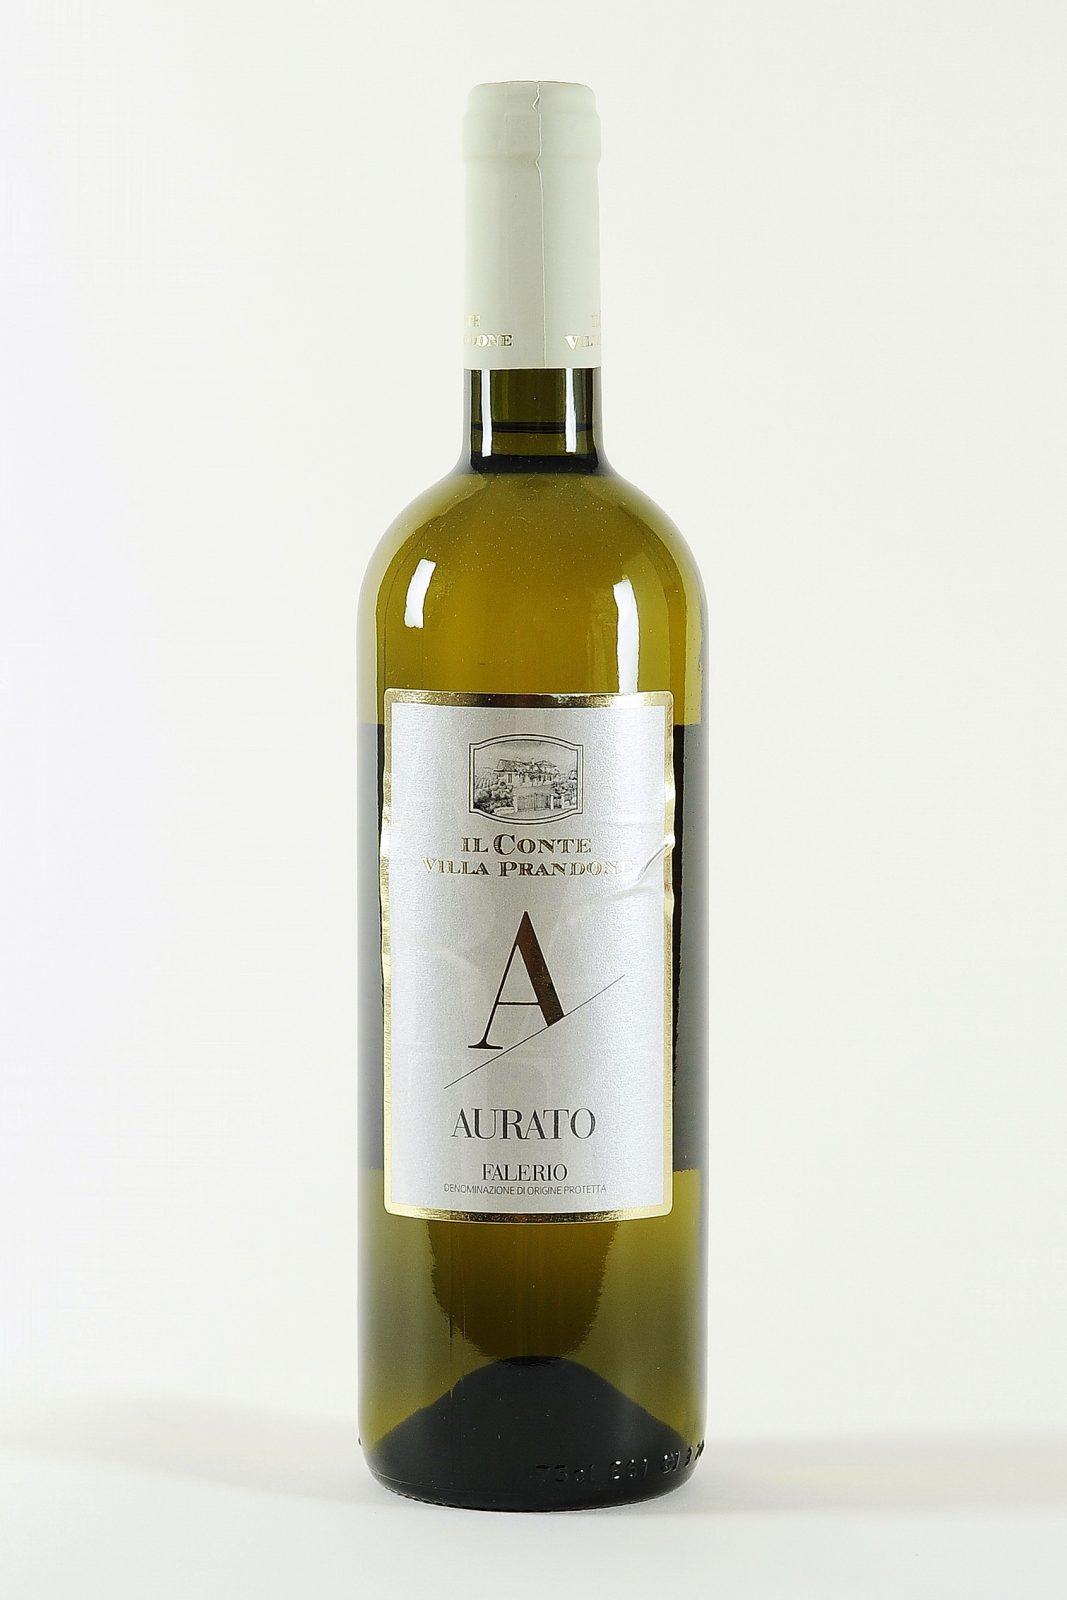 Aurato Falerio Pecorino DOP